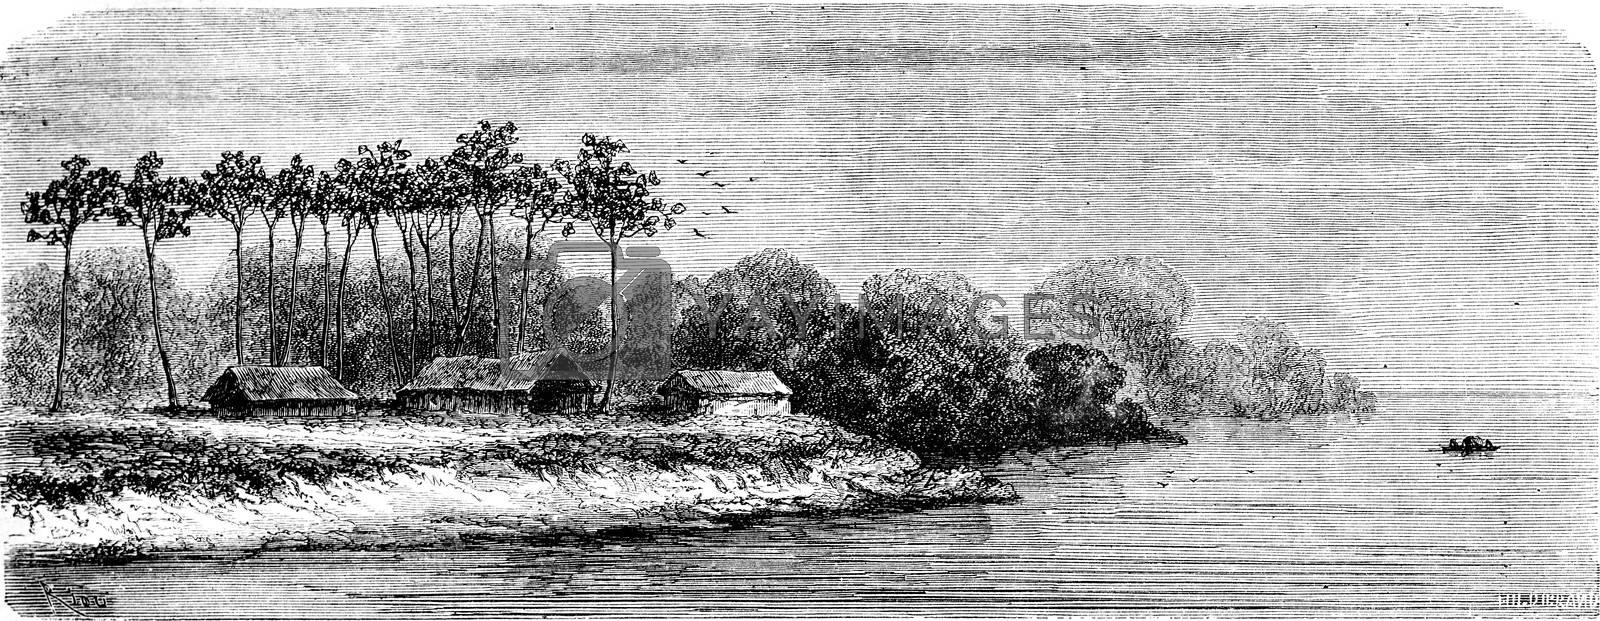 Accommodation Piros-Chontaquiros, vintage engraved illustration. Le Tour du Monde, Travel Journal, (1865).